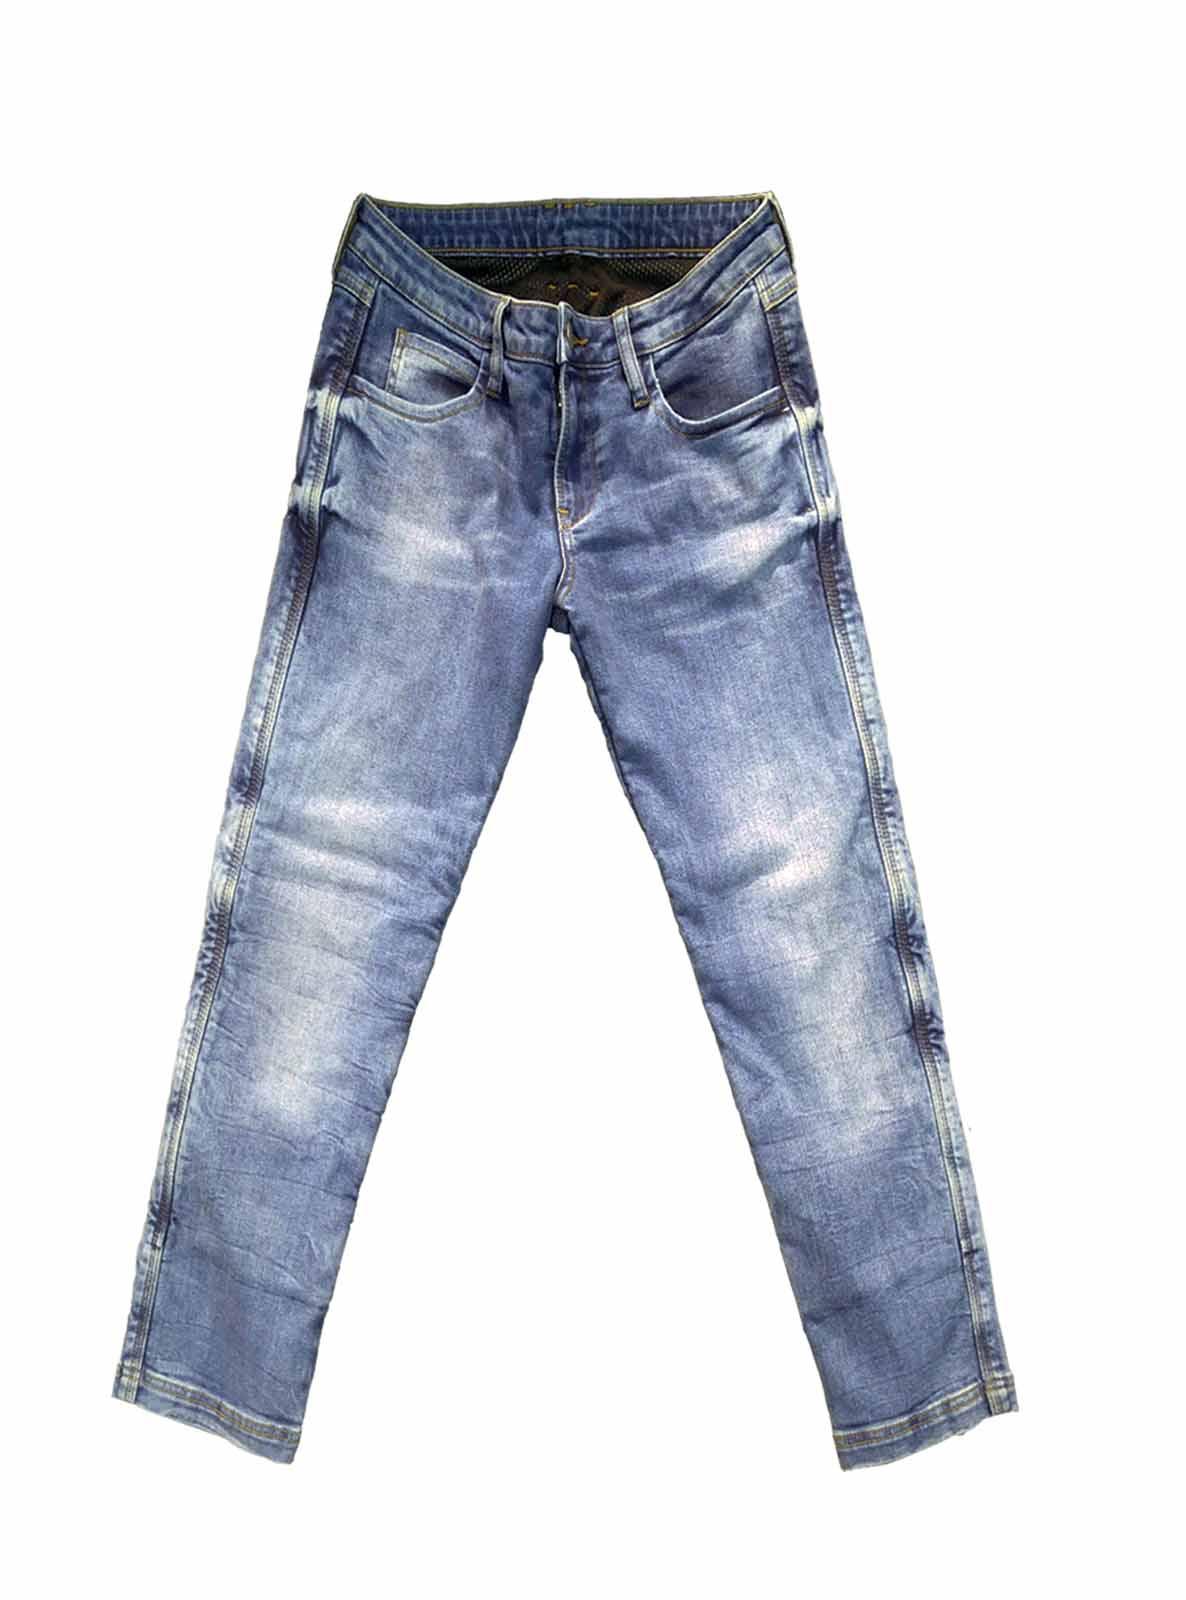 Bull - it SR6 Ocean Jeans Dames Slim Fit